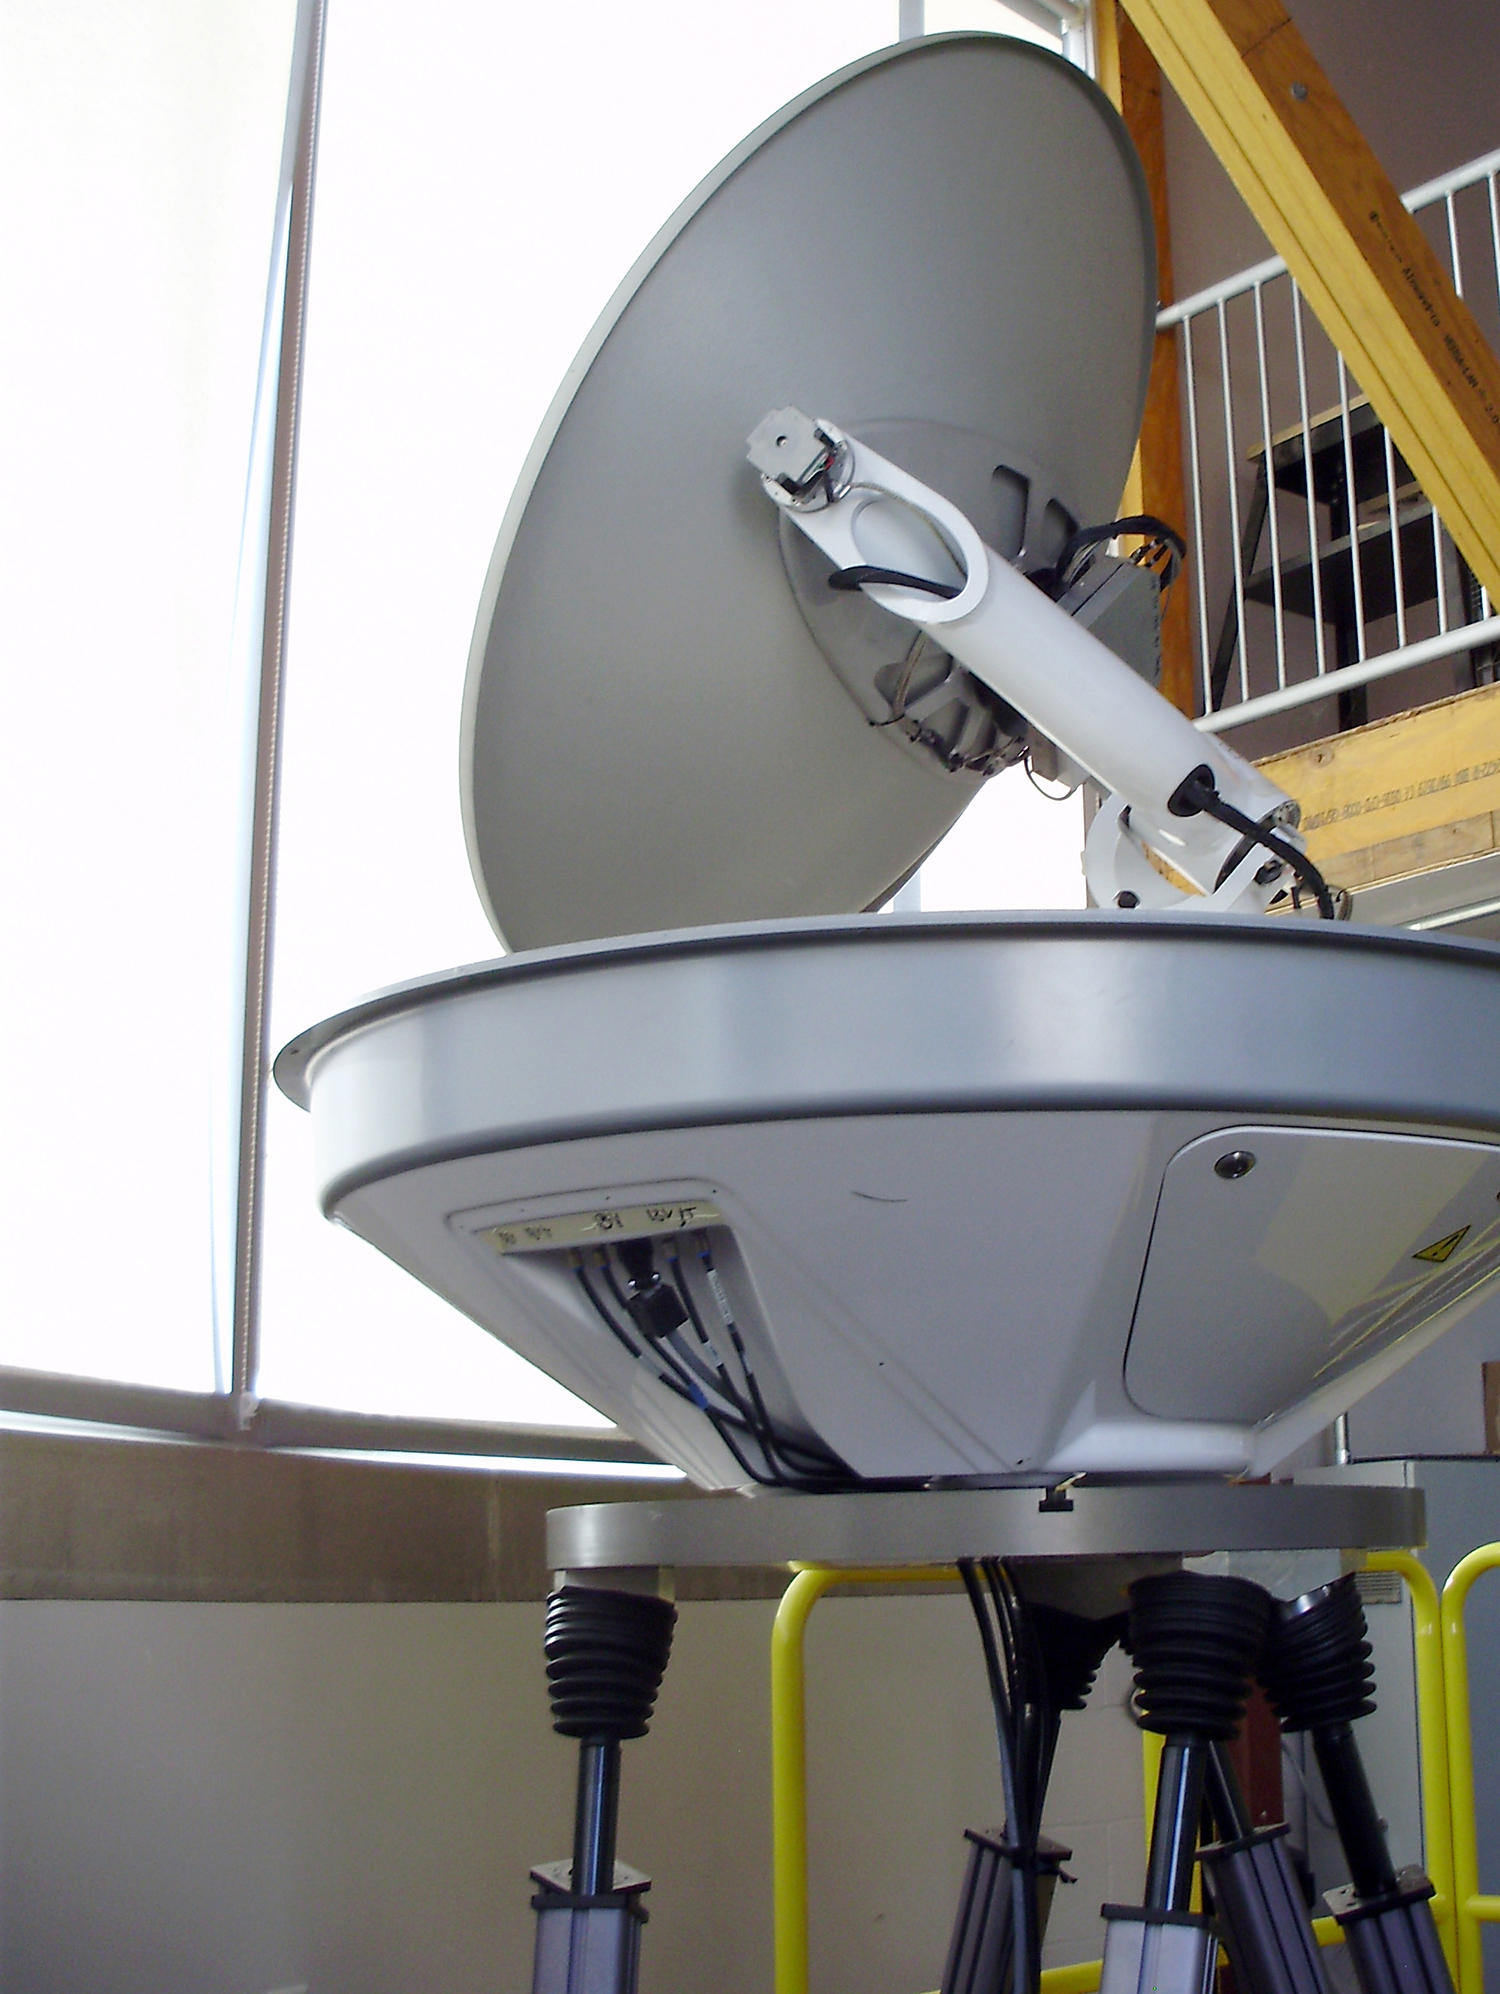 A KVH satellite antenna awaits motion testing.